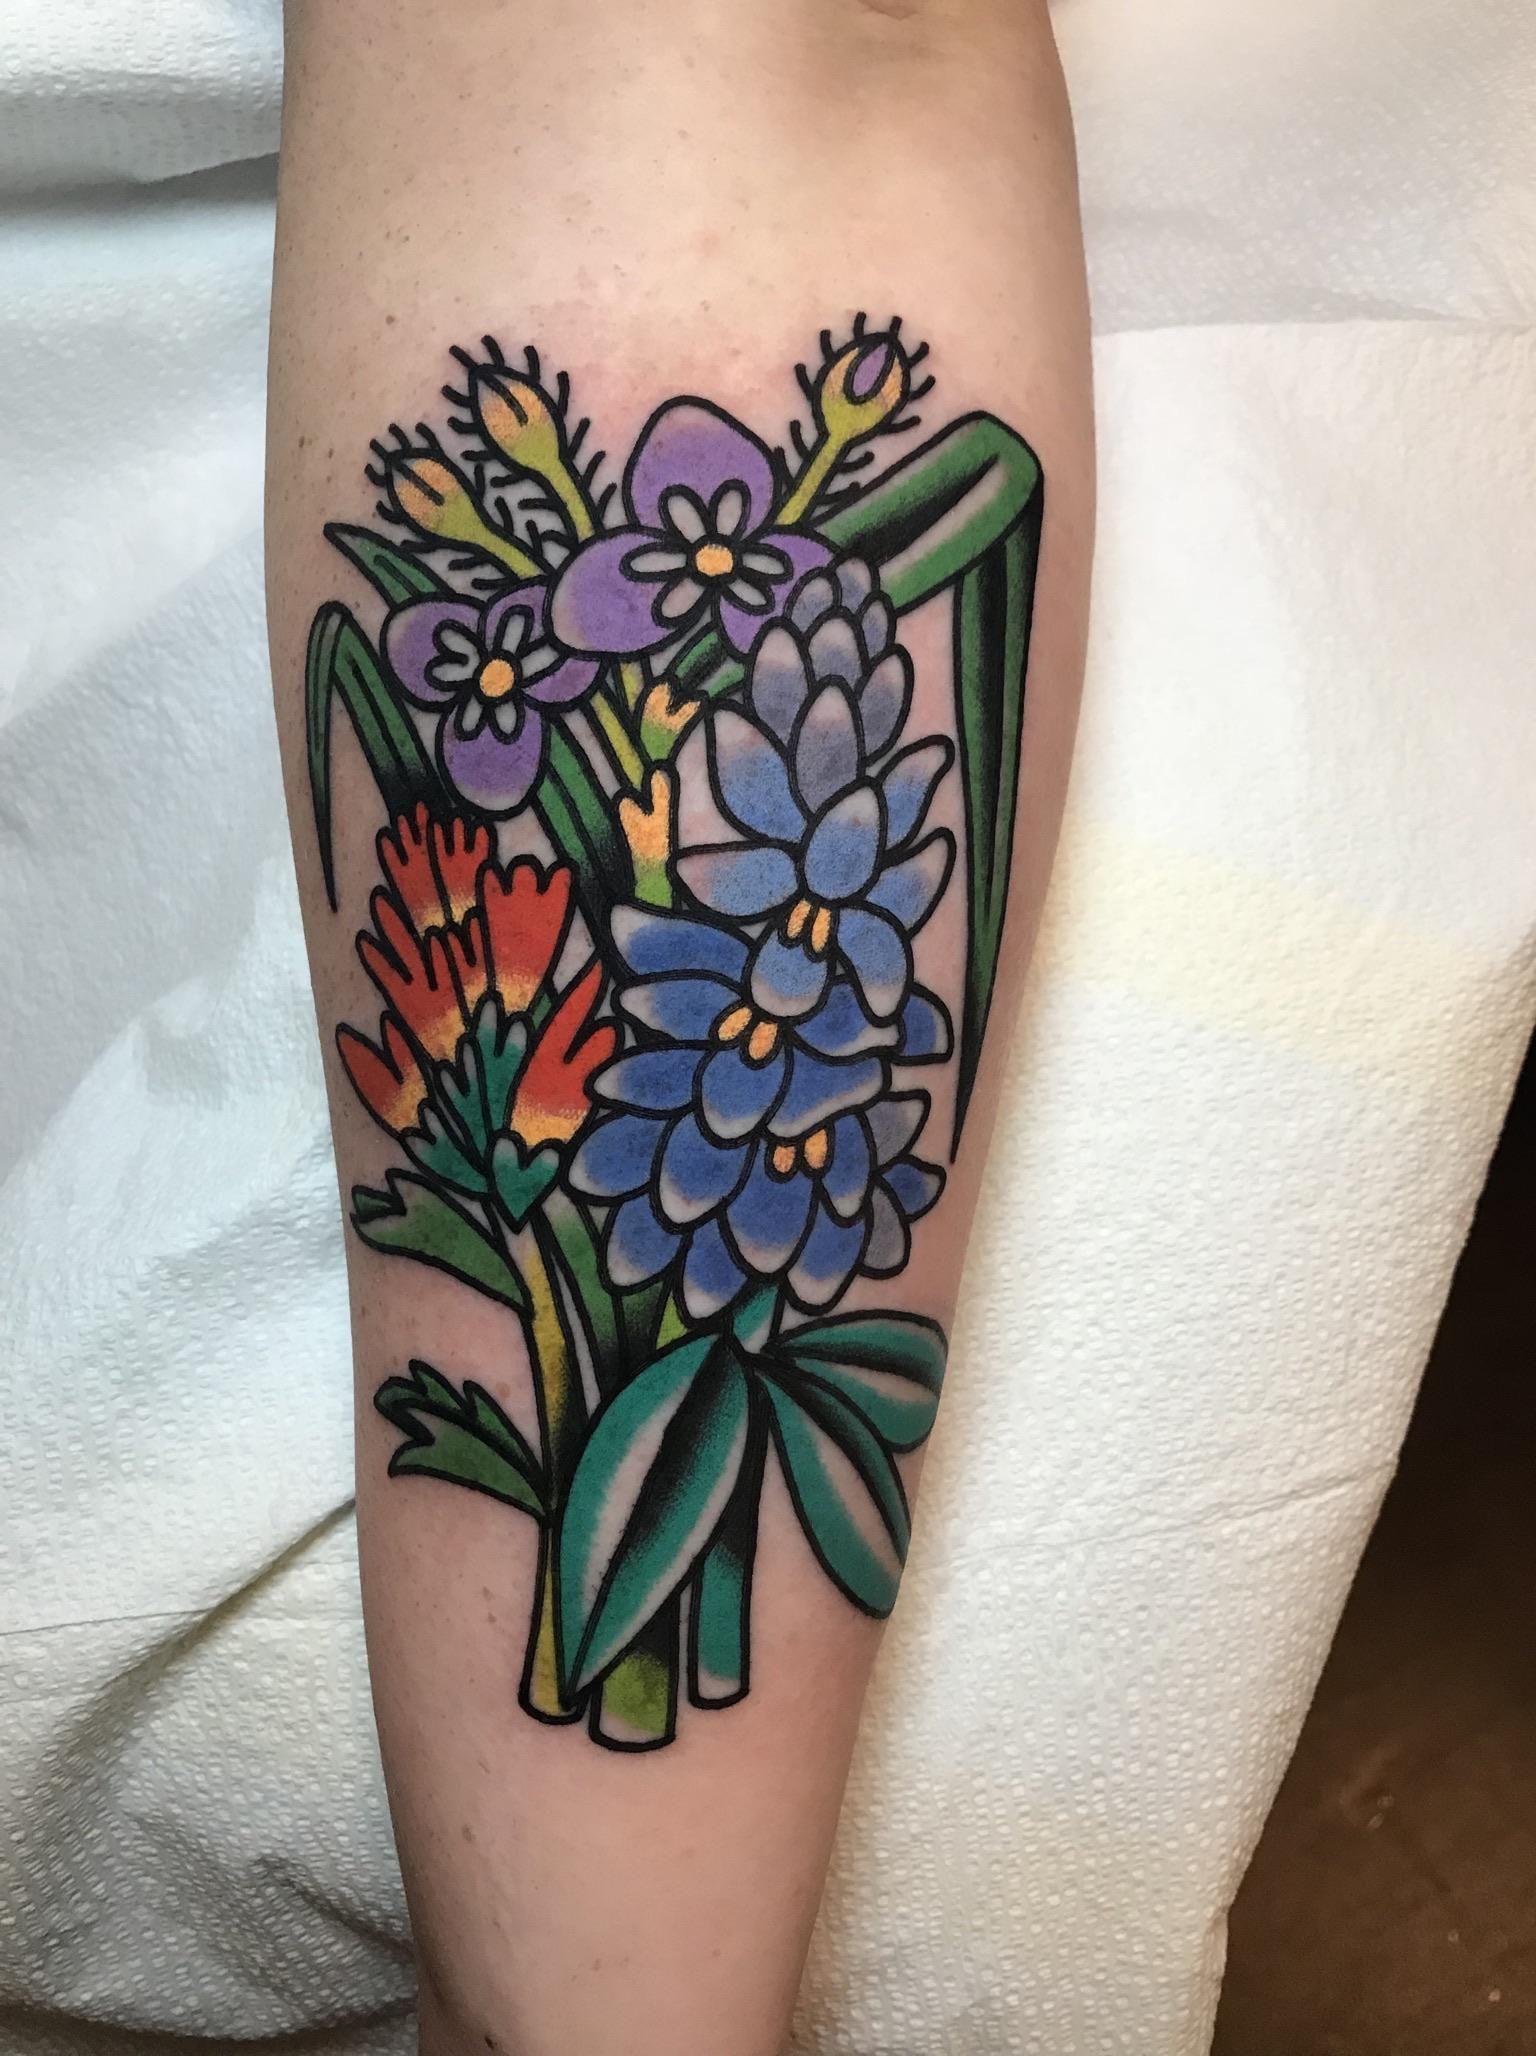 Fresh N Floral By Julia Campione Good Omen Tattoo In Chicago Il Tattoos Prison Tattoos R Tattoo